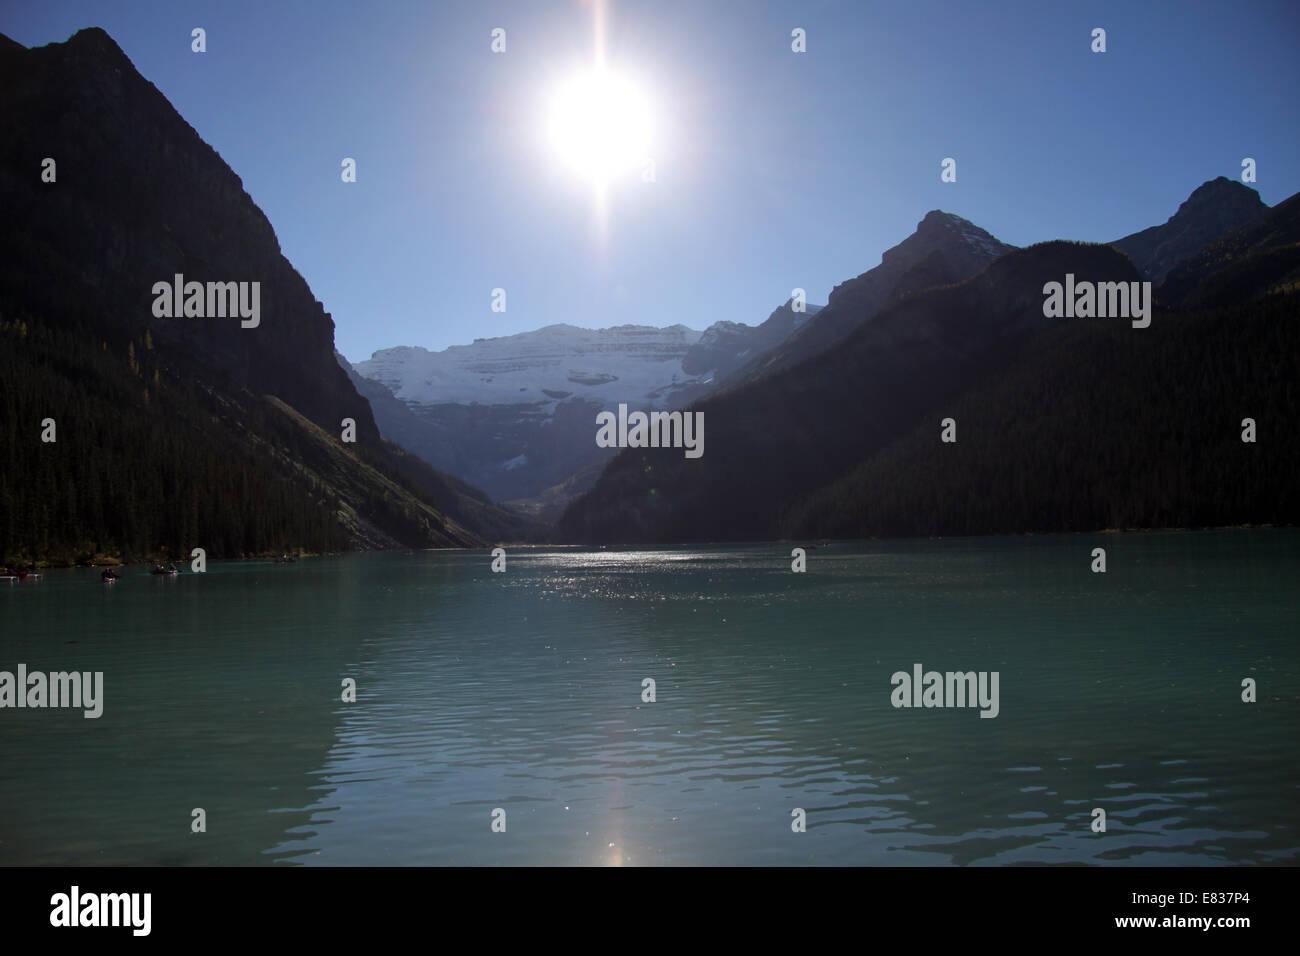 Lake Louise in der Nähe von Banff, Alberta, Kanada Stockbild